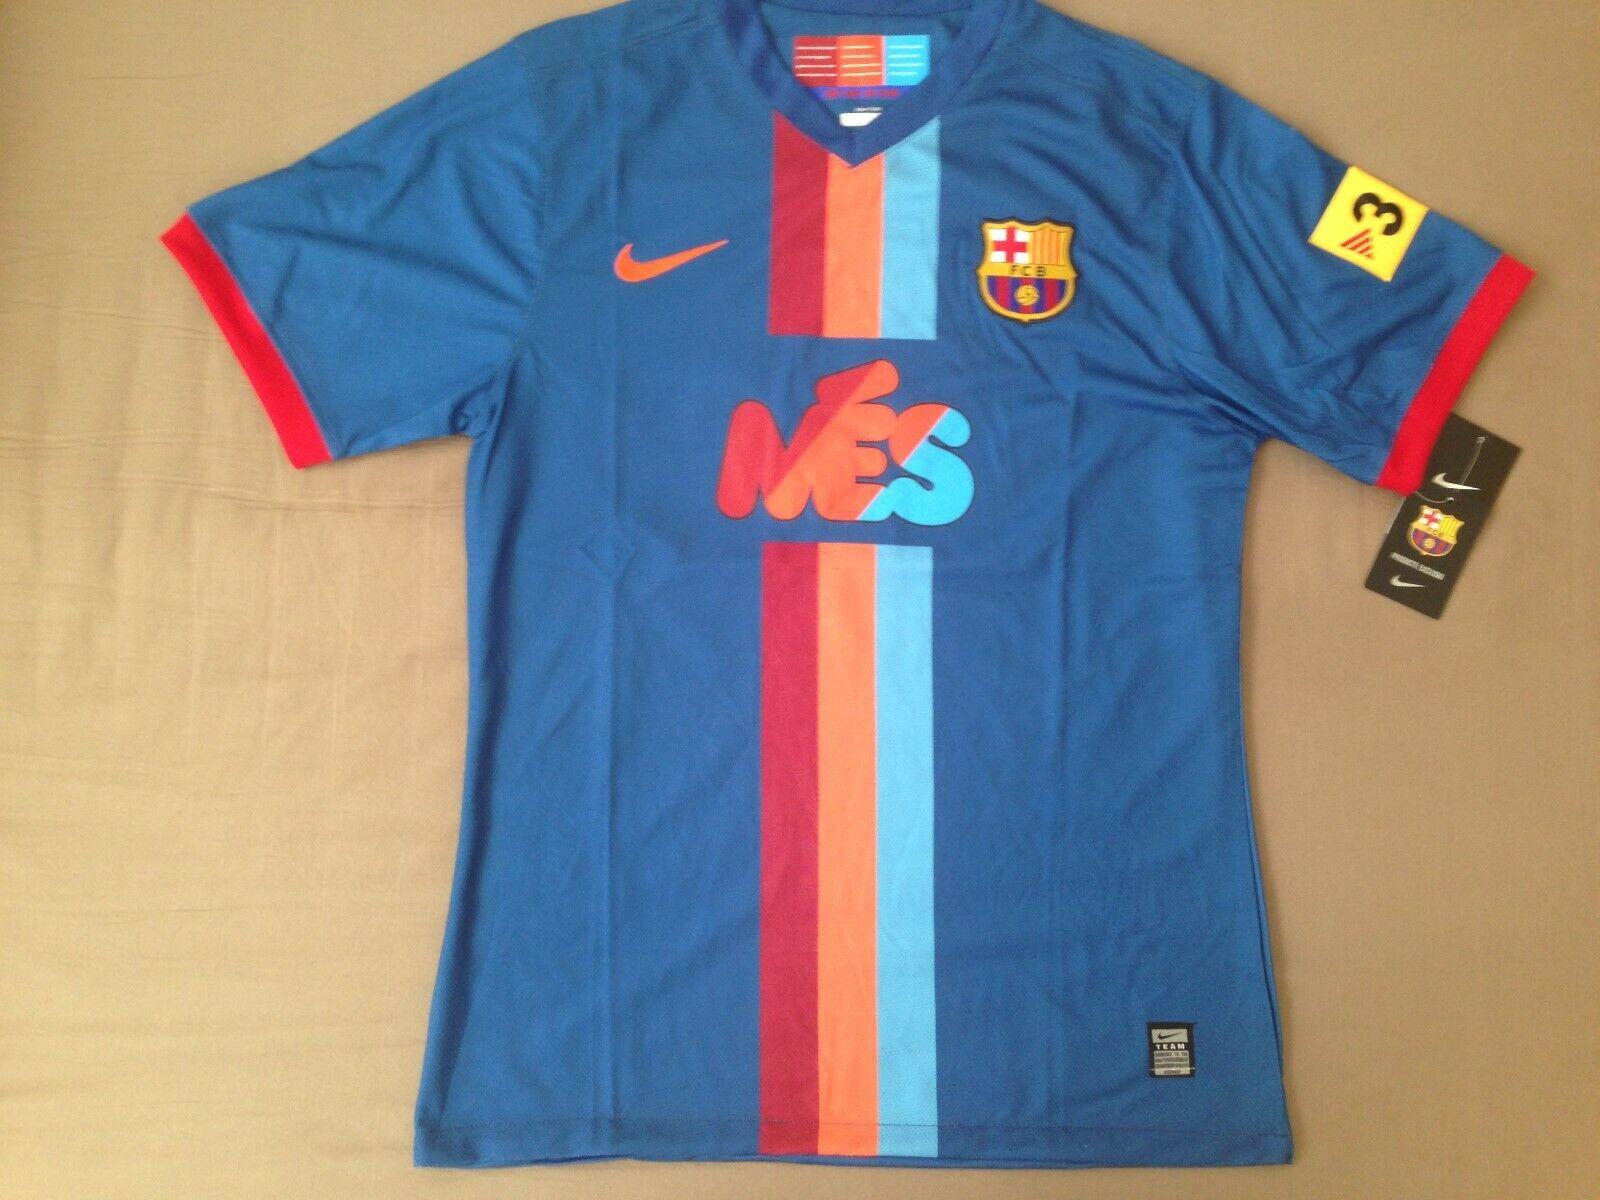 Barcelona Leo Messi 2009 jersey gamper cup rare retro shirt